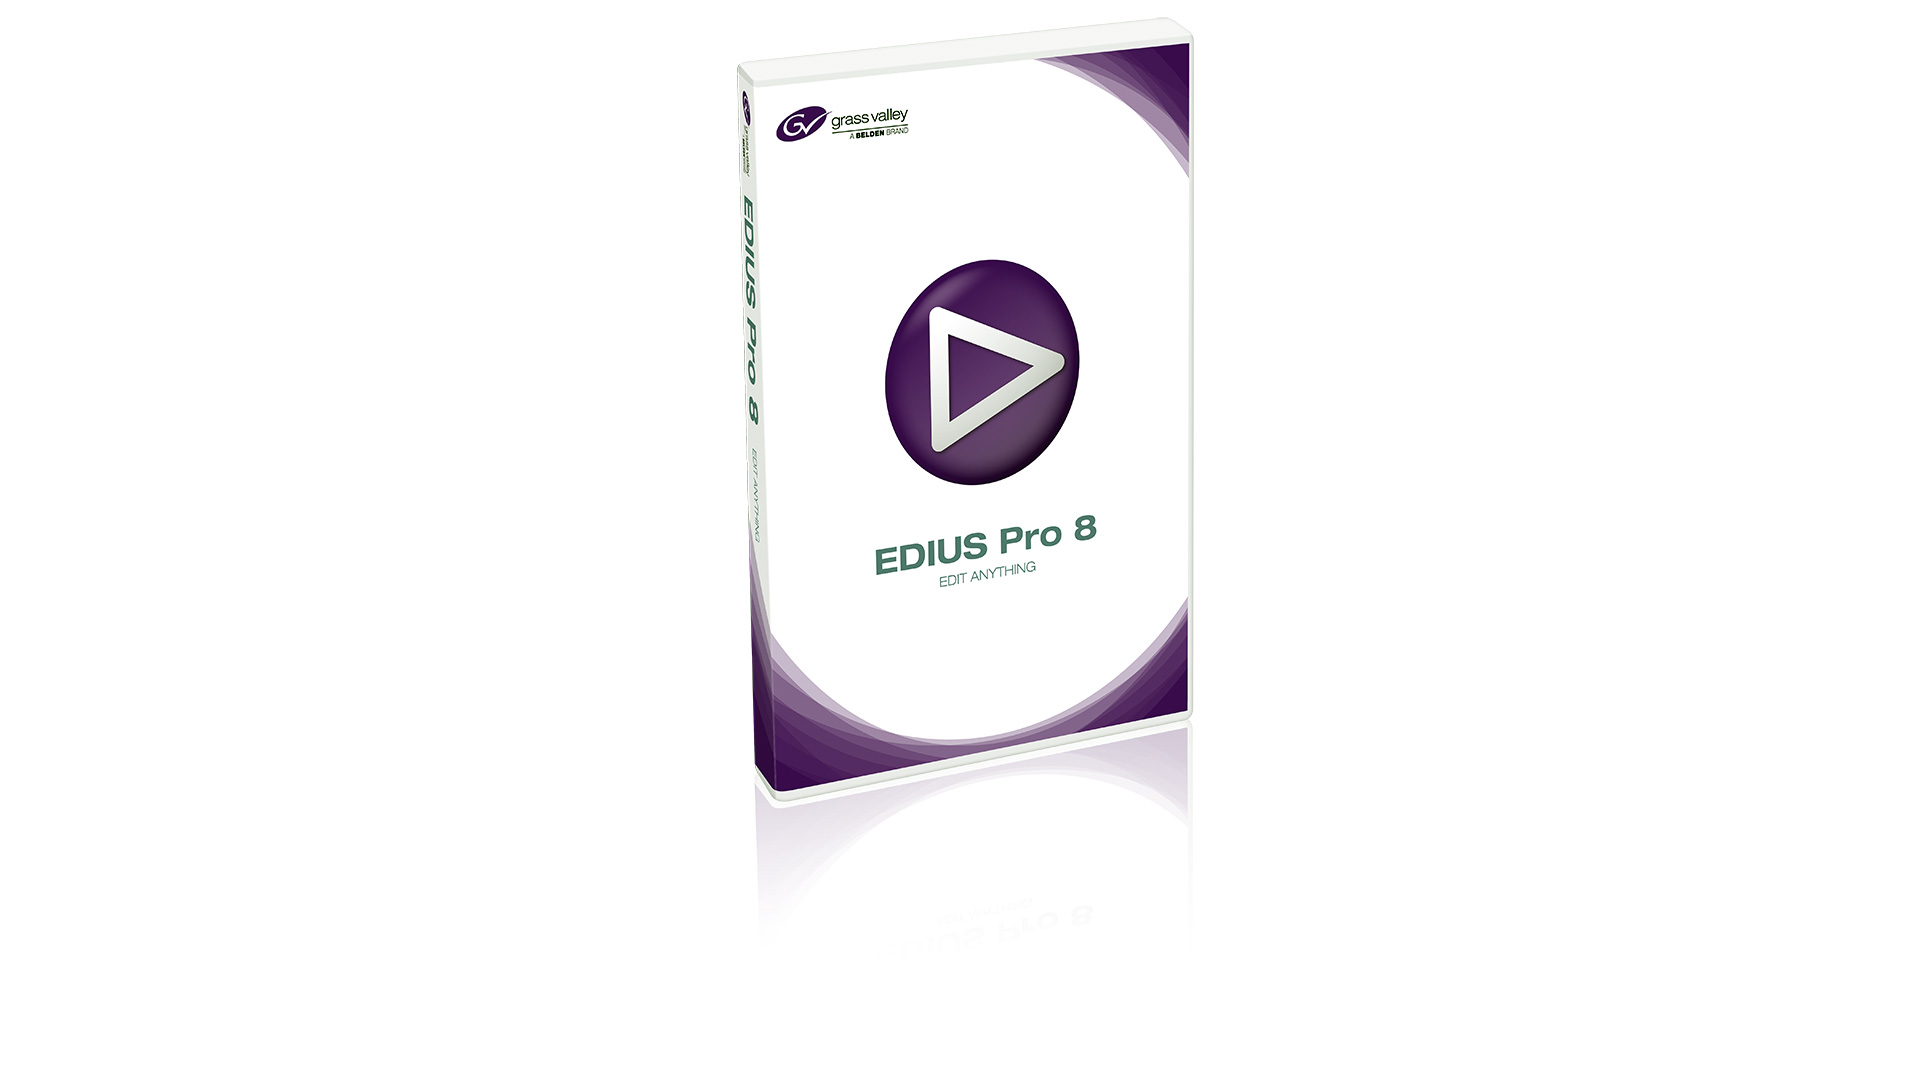 EDIUS Pro 8 Free Download - ALL PC World